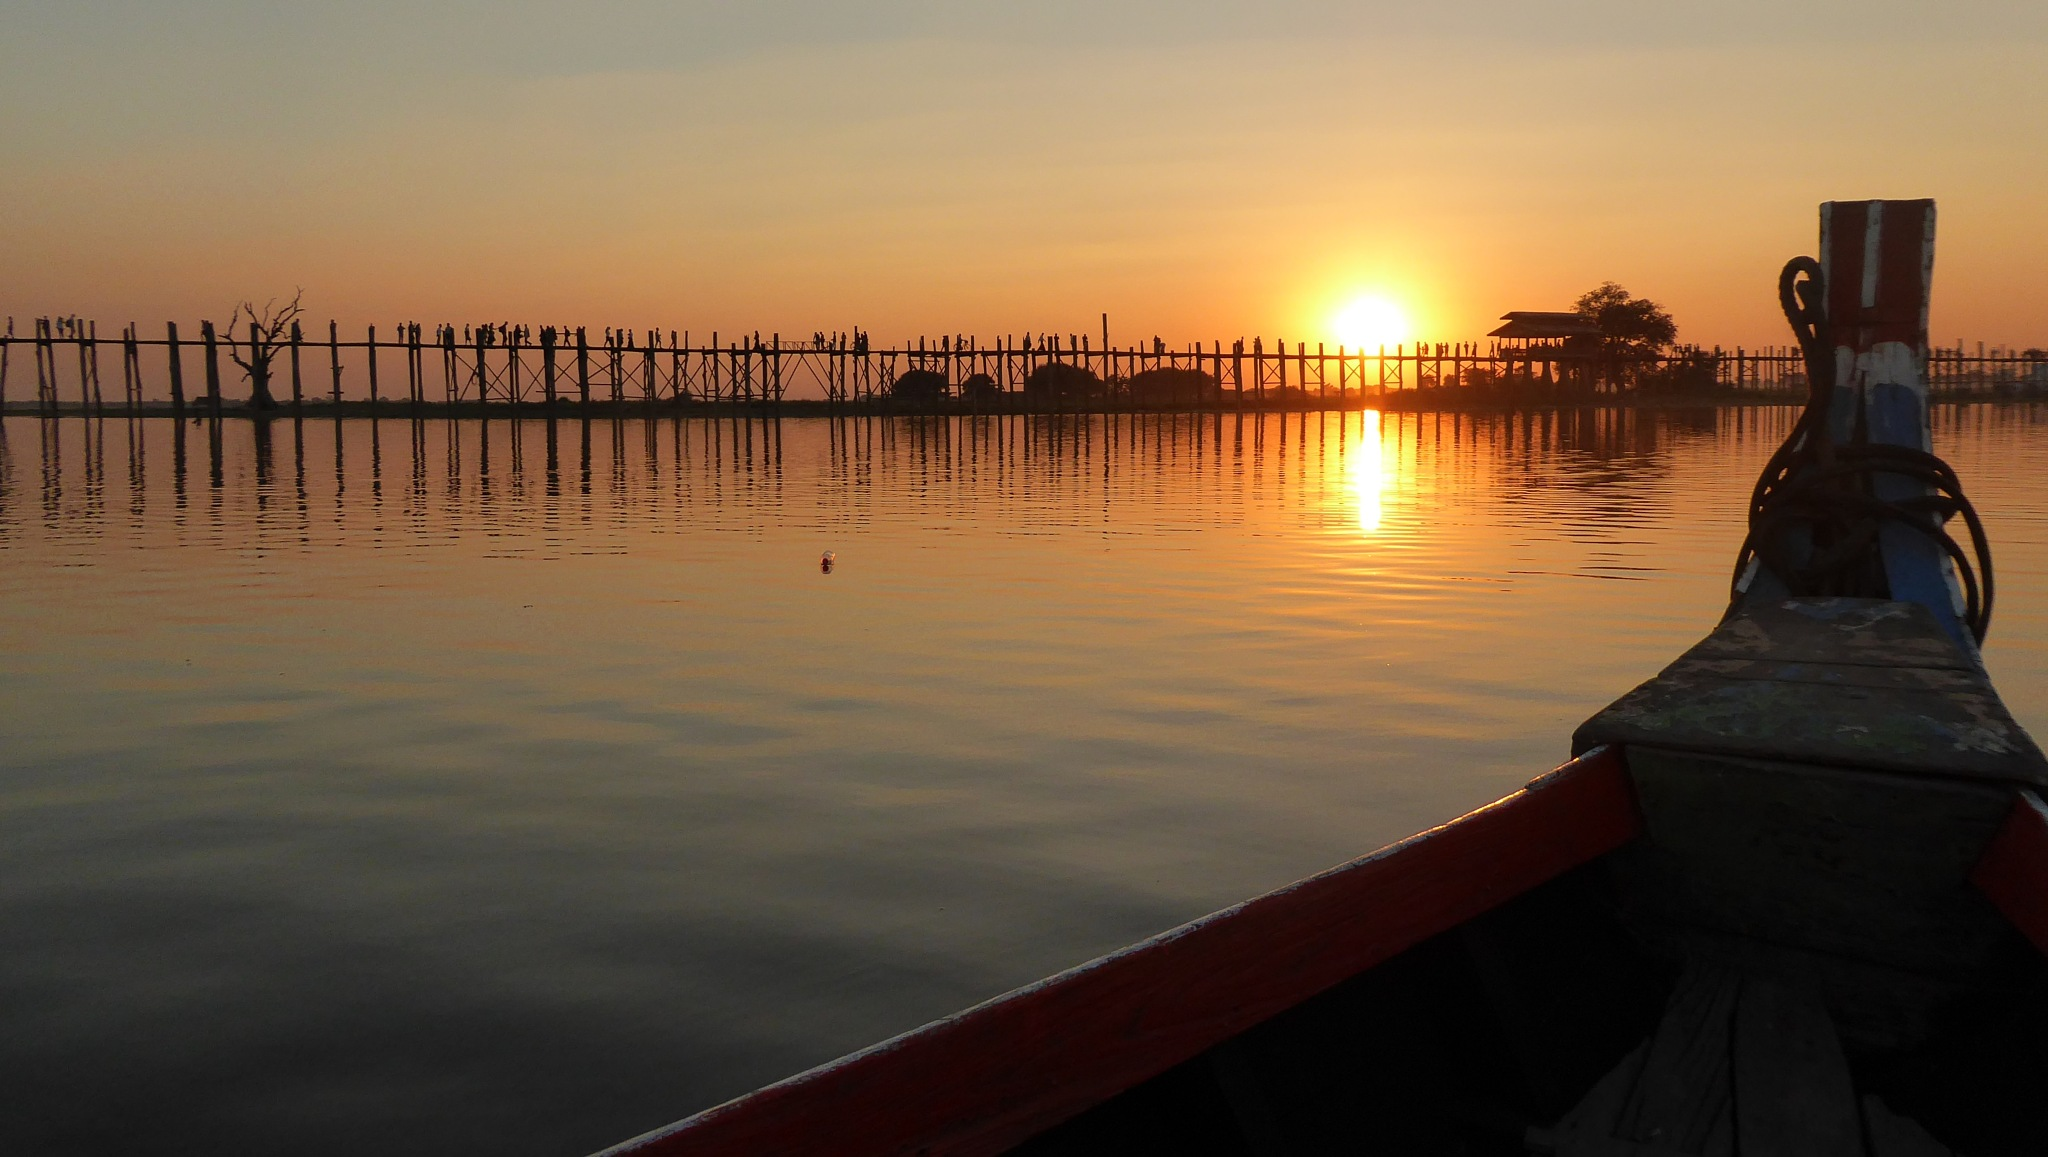 Sunset at the U Bein Bridge by Aroundtheworldin8000days